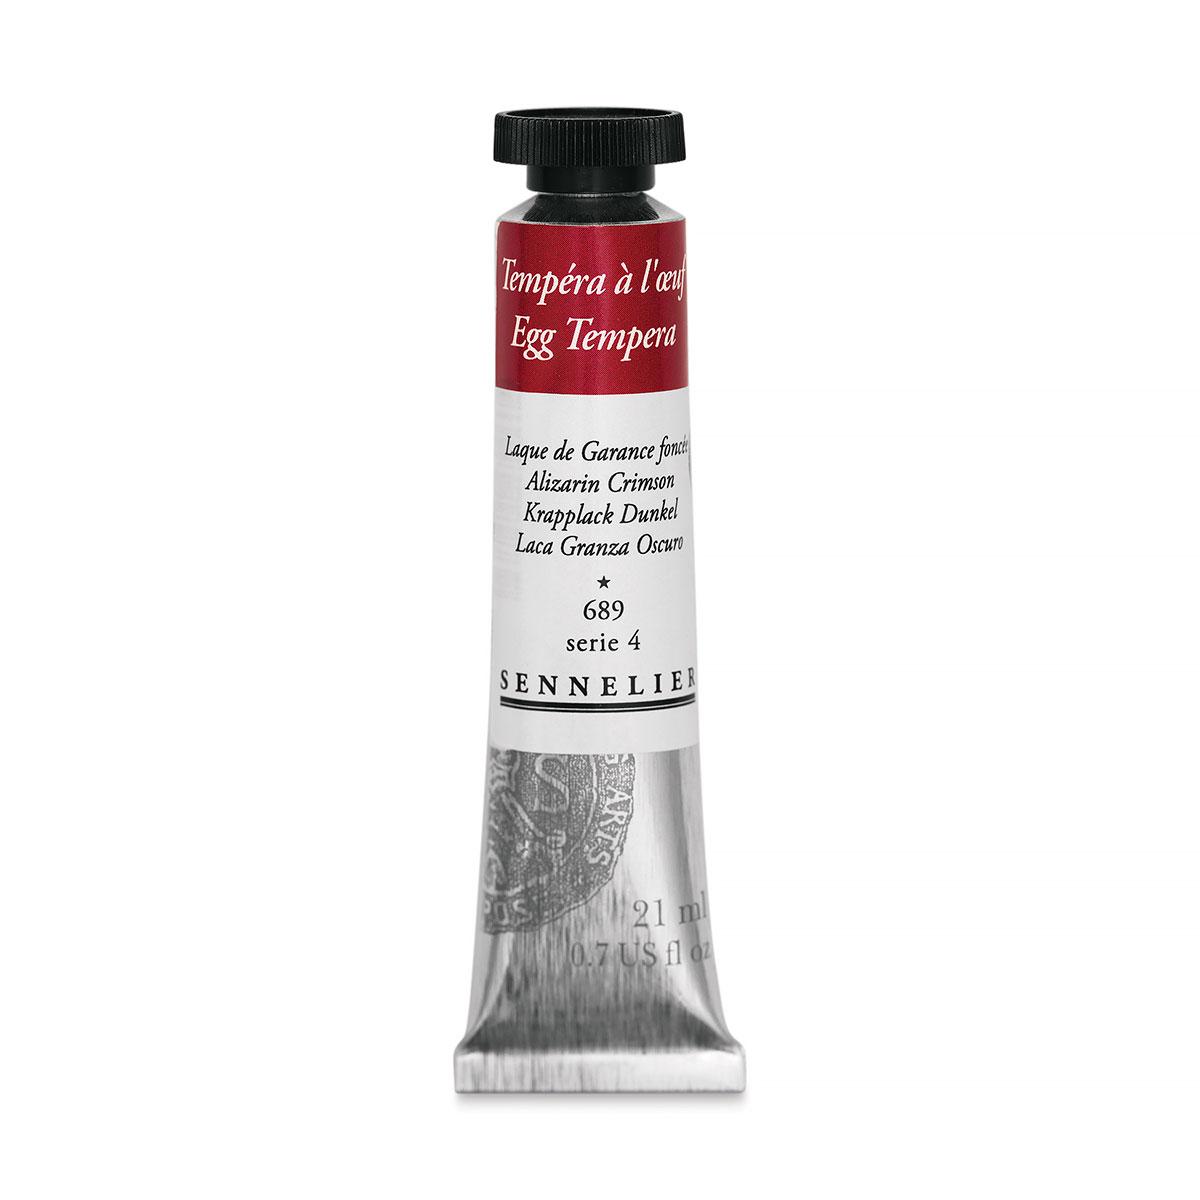 Sennelier Artists Egg Tempera - Alizarin Crimson, 21 ml tube